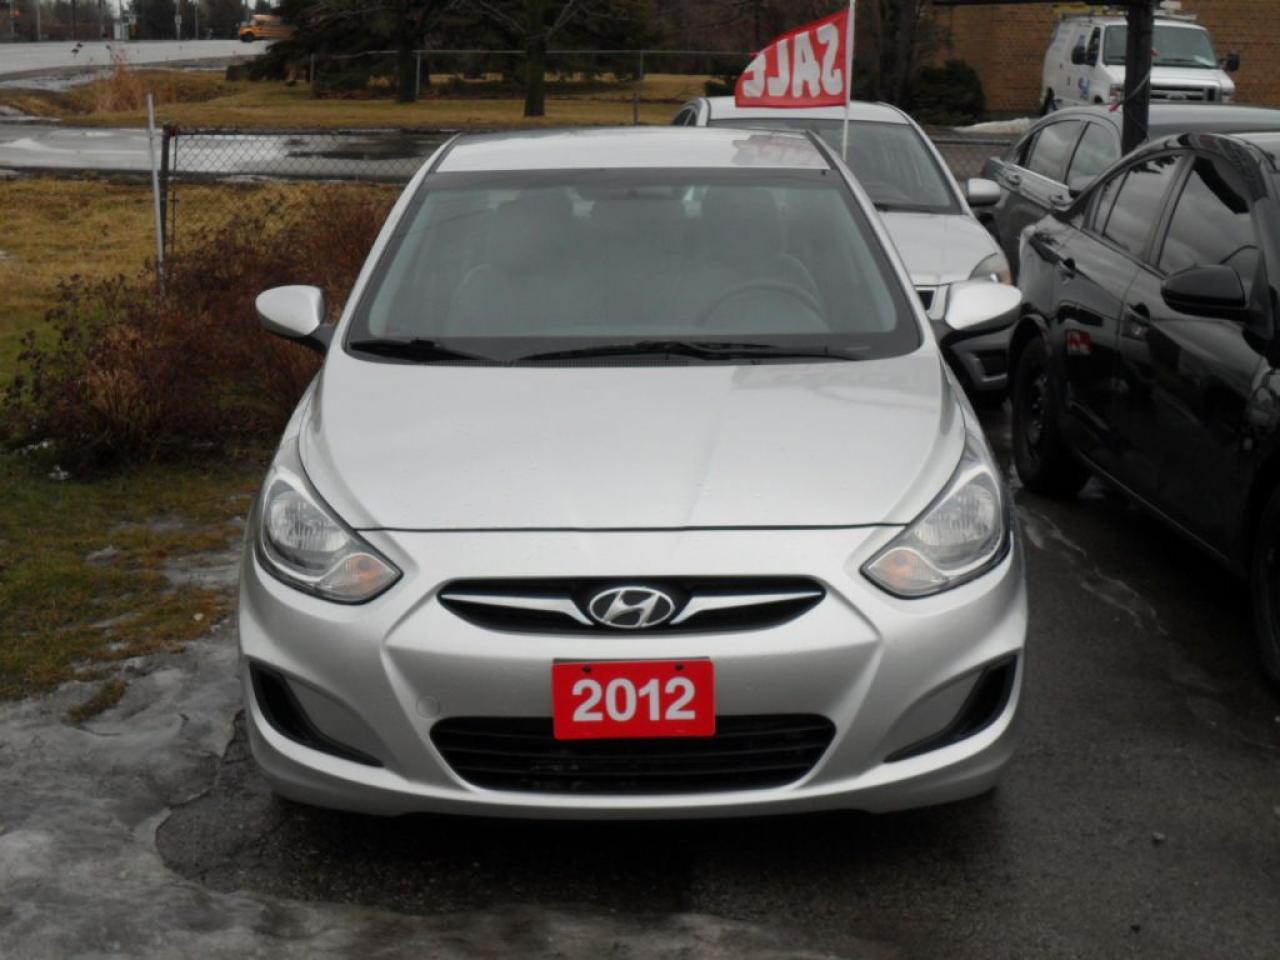 Photo of Silver 2012 Hyundai Accent